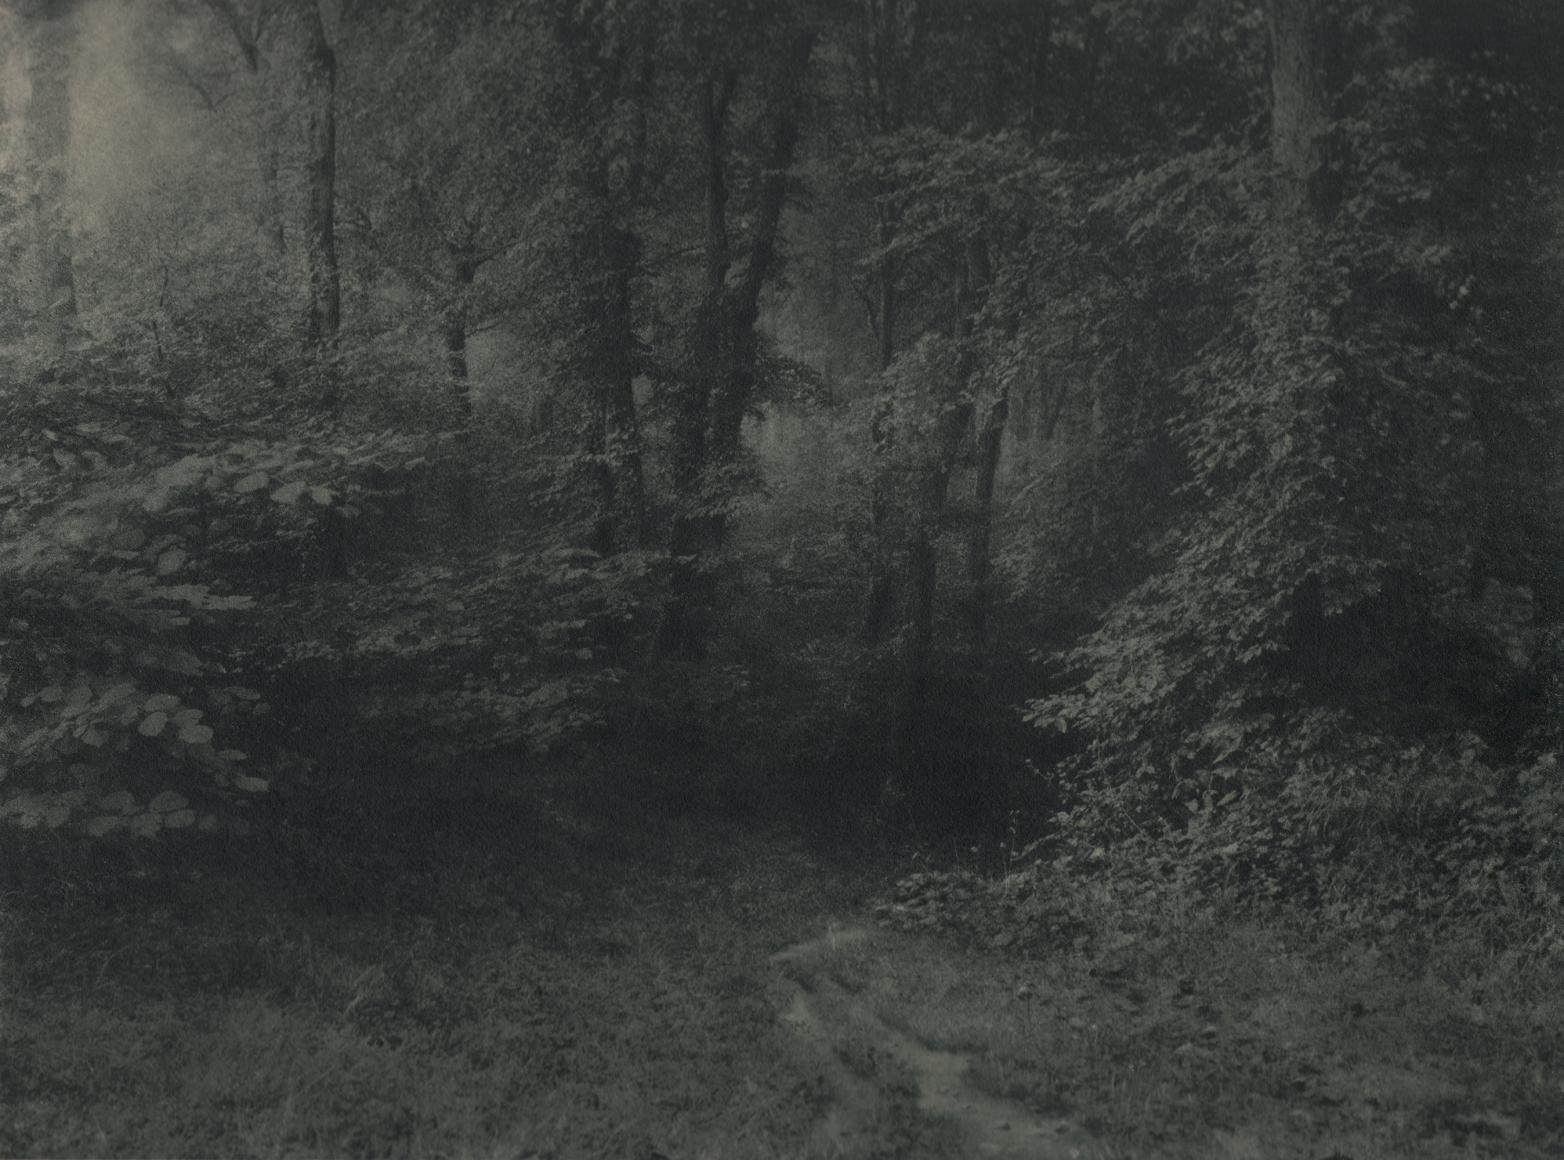 26. Léonard Misonne, Untitled, n.d. Dark, wooded path. Gray/green-toned print.